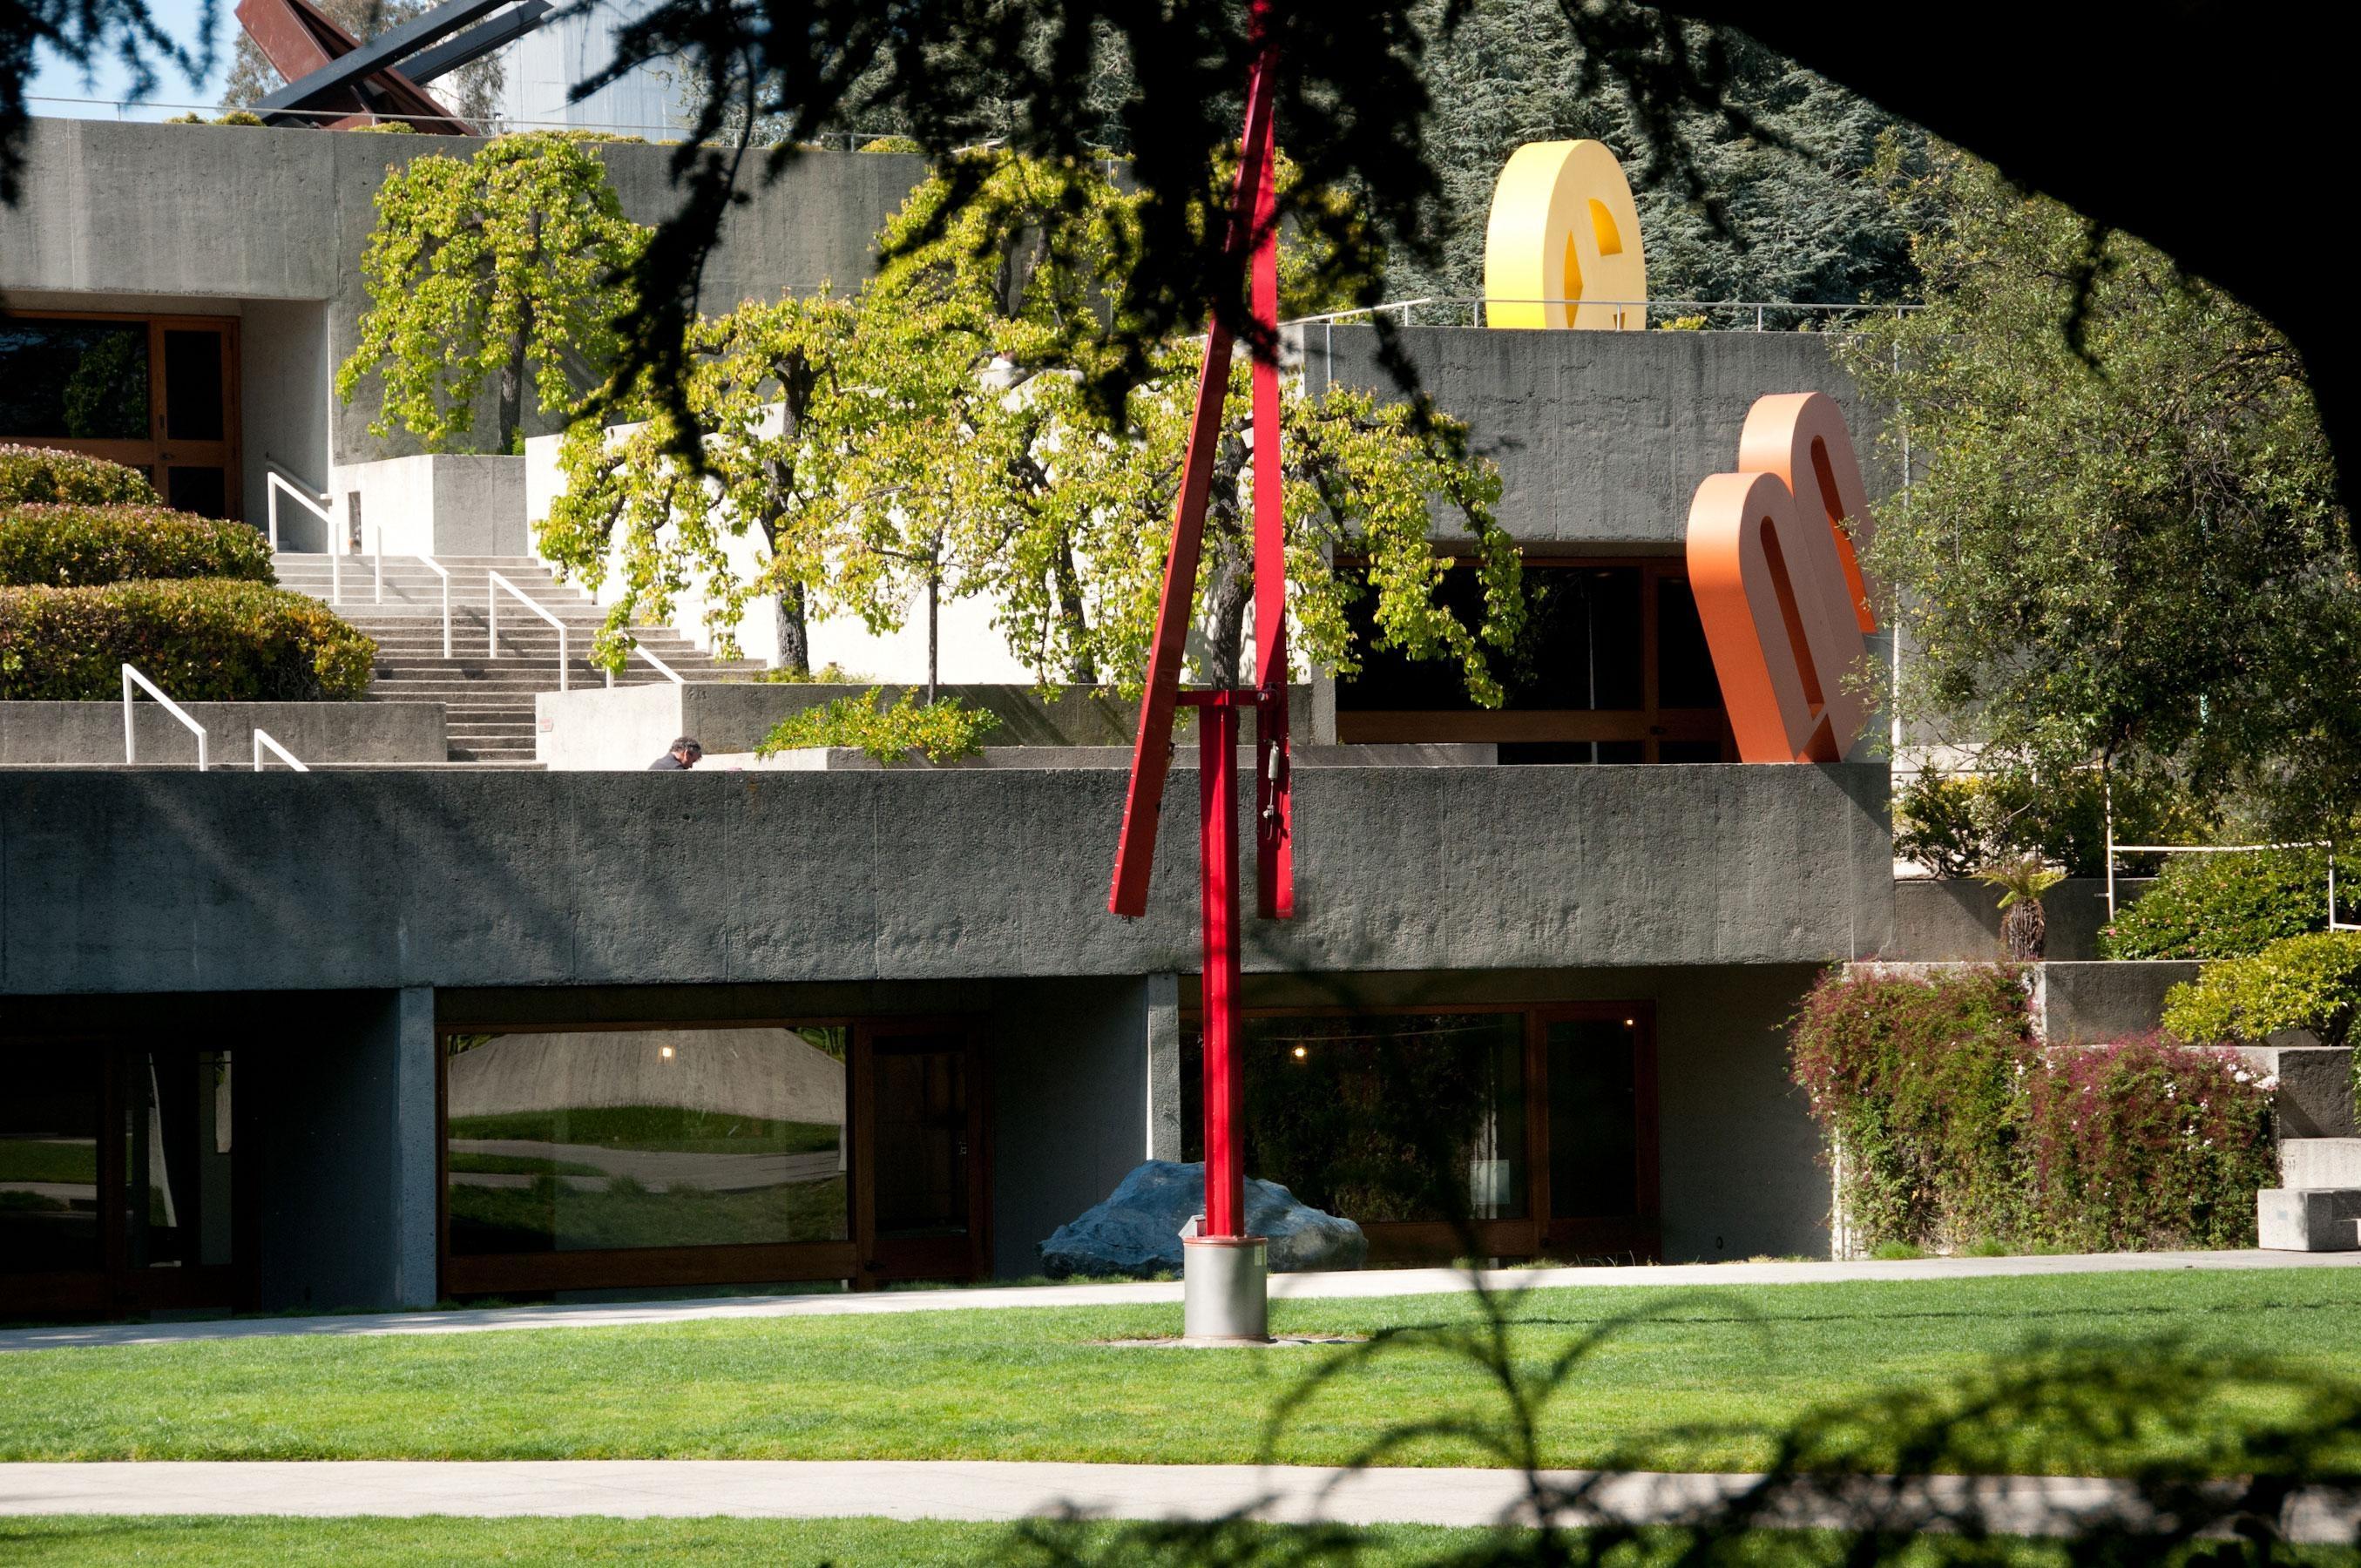 Oakland Museum of California - Oakland, CA